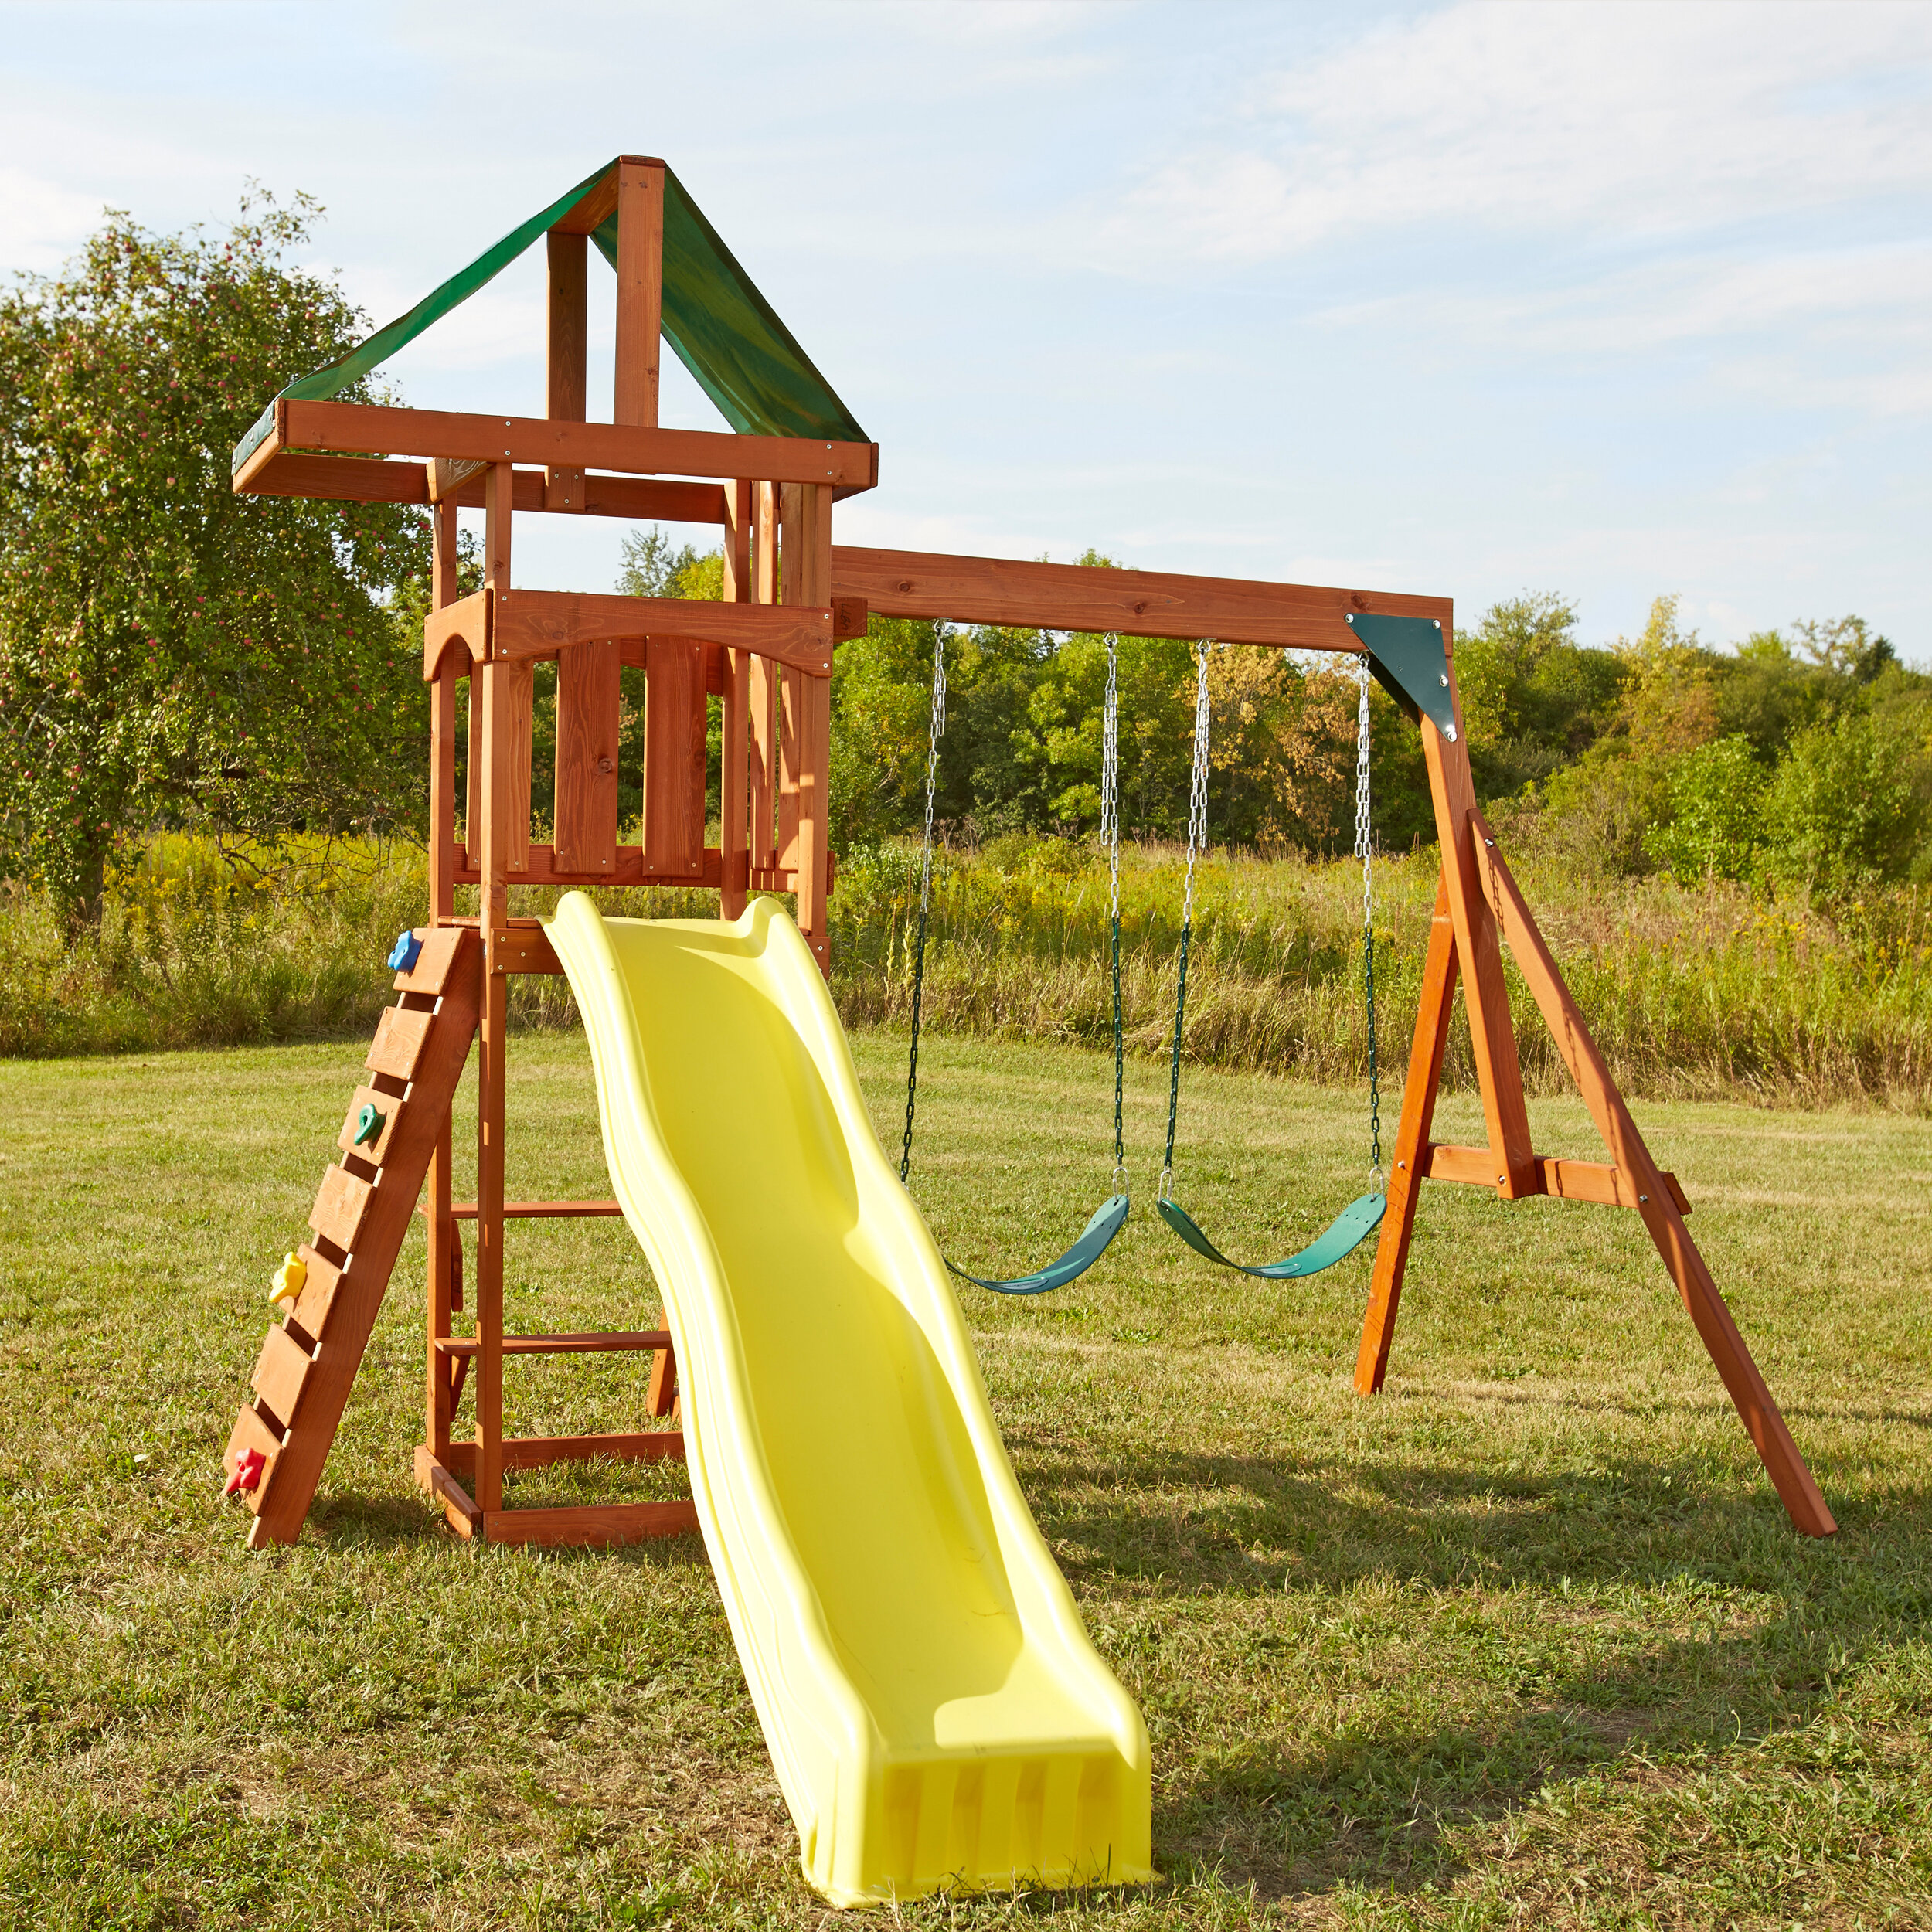 da50d23b12e Swing-n-Slide Play Set Scrambler Swing Set   Reviews